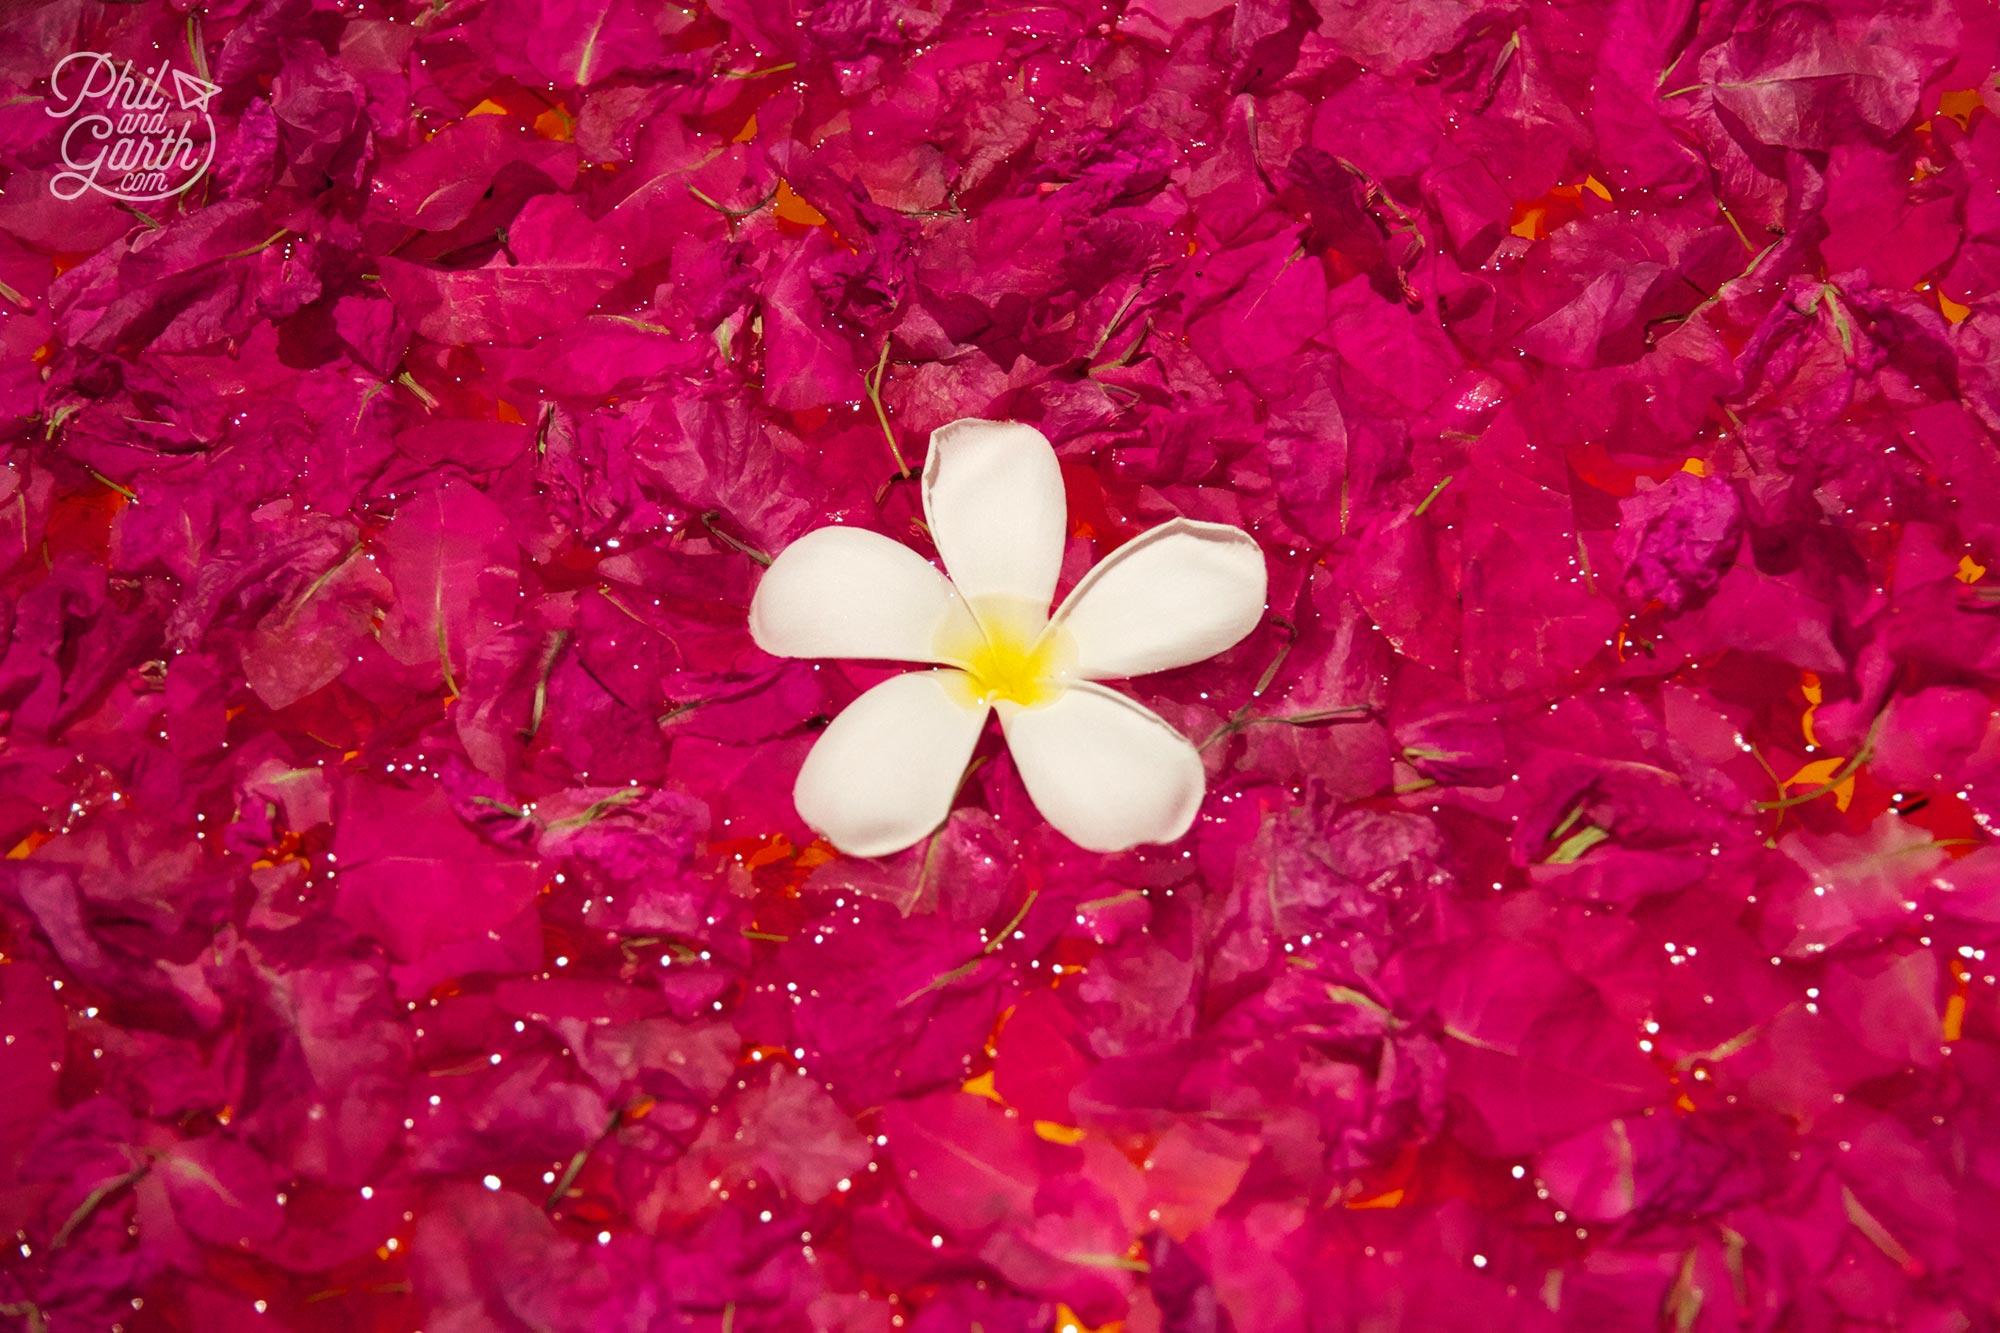 So many simple yet beautiful displays using flower petals